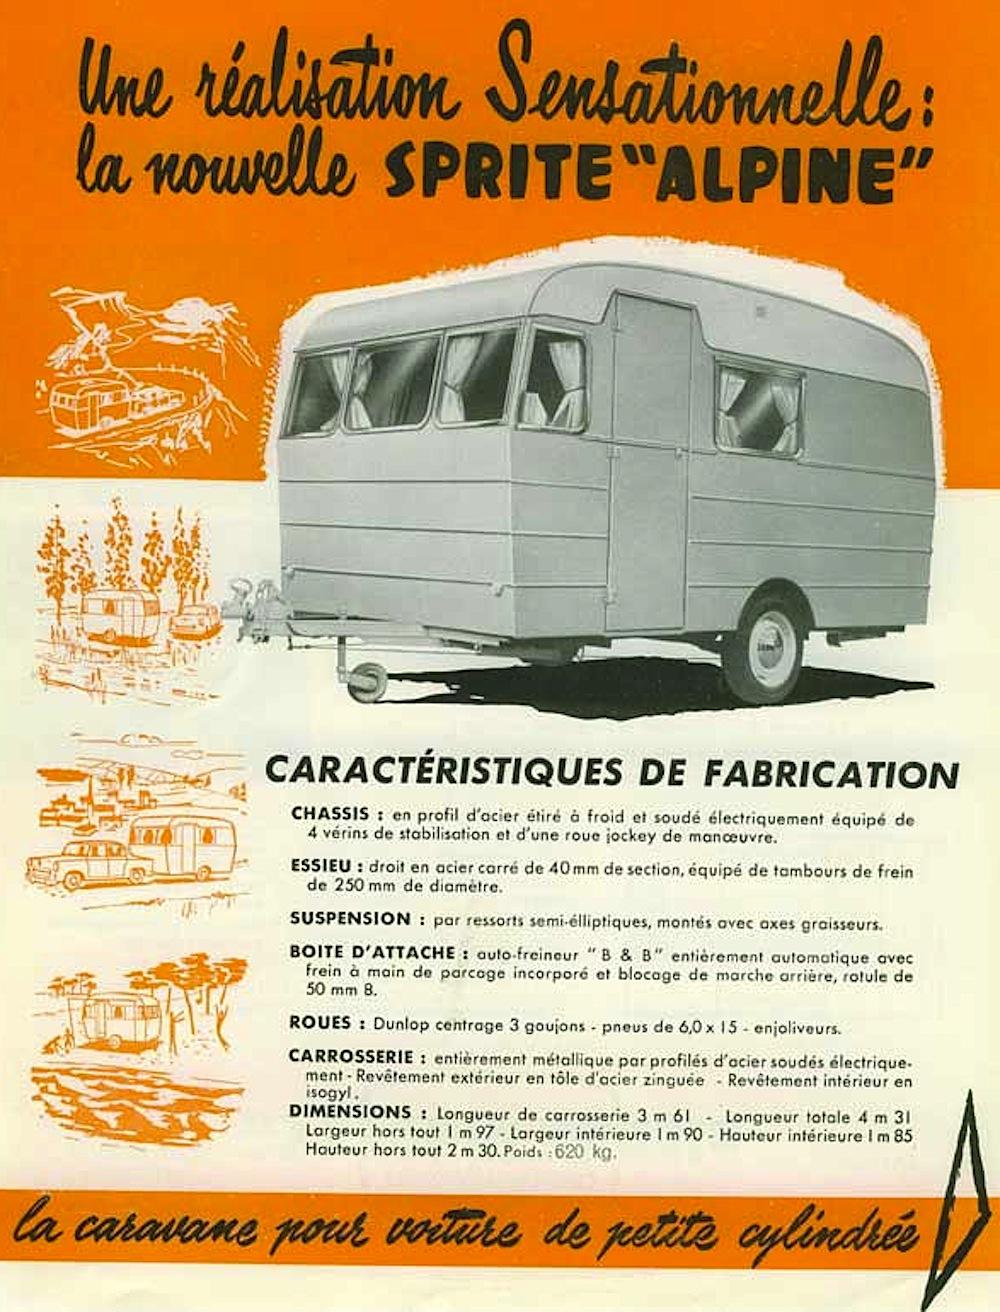 1590994490_sprite-alpine.jpg